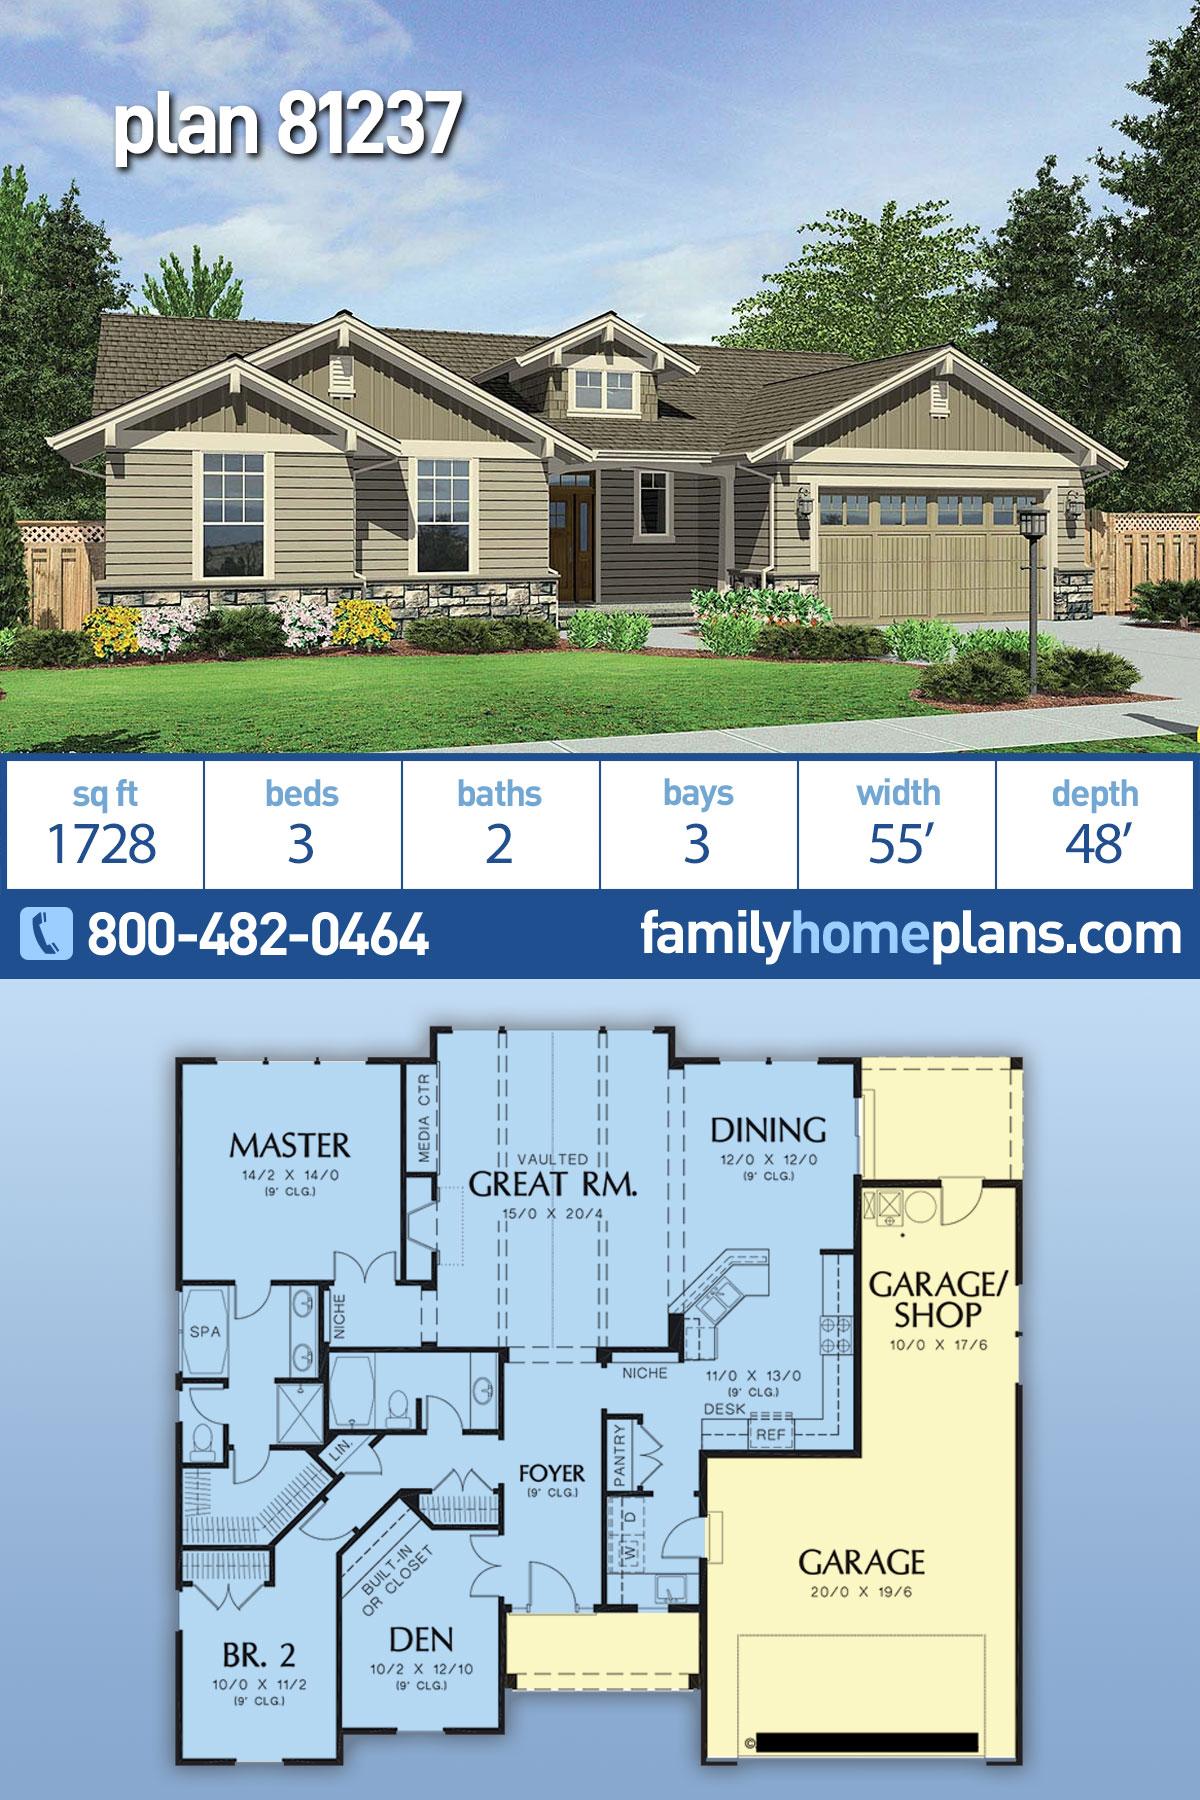 Craftsman House Plan 81237 with 2 Beds, 2 Baths, 3 Car Garage